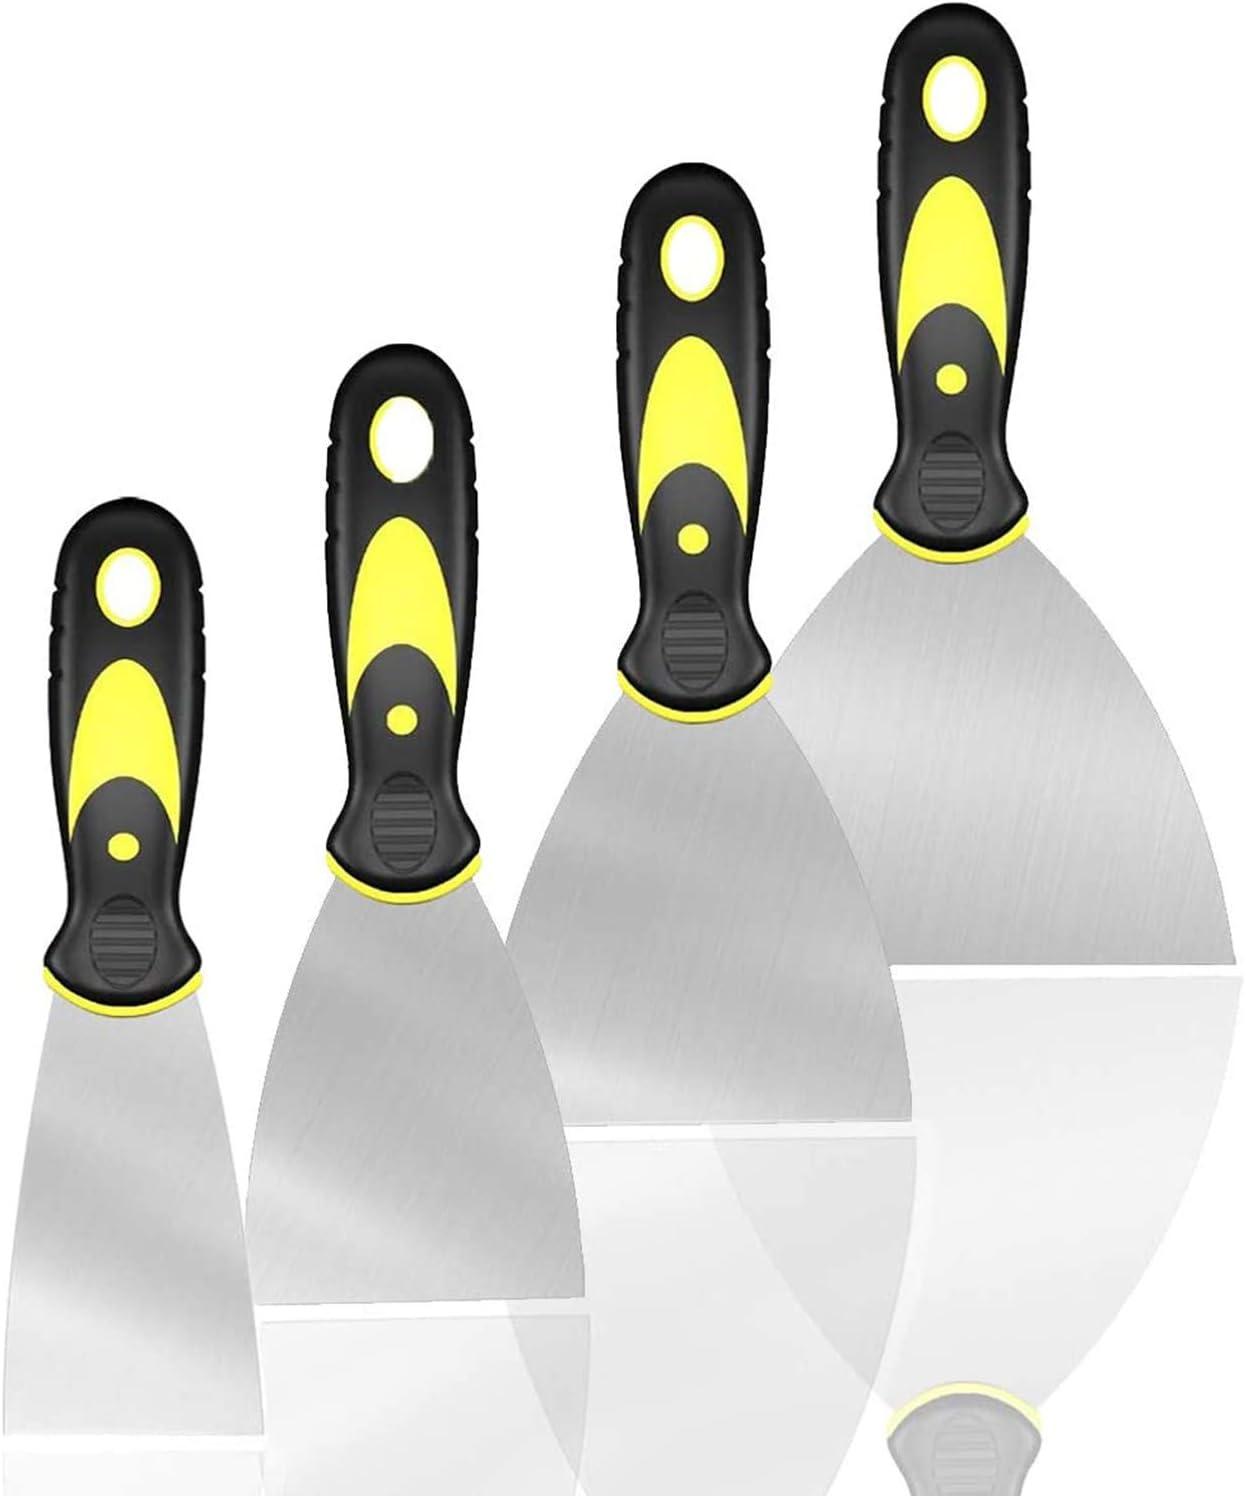 4 Pack Putty Knife Scrapers Set 2